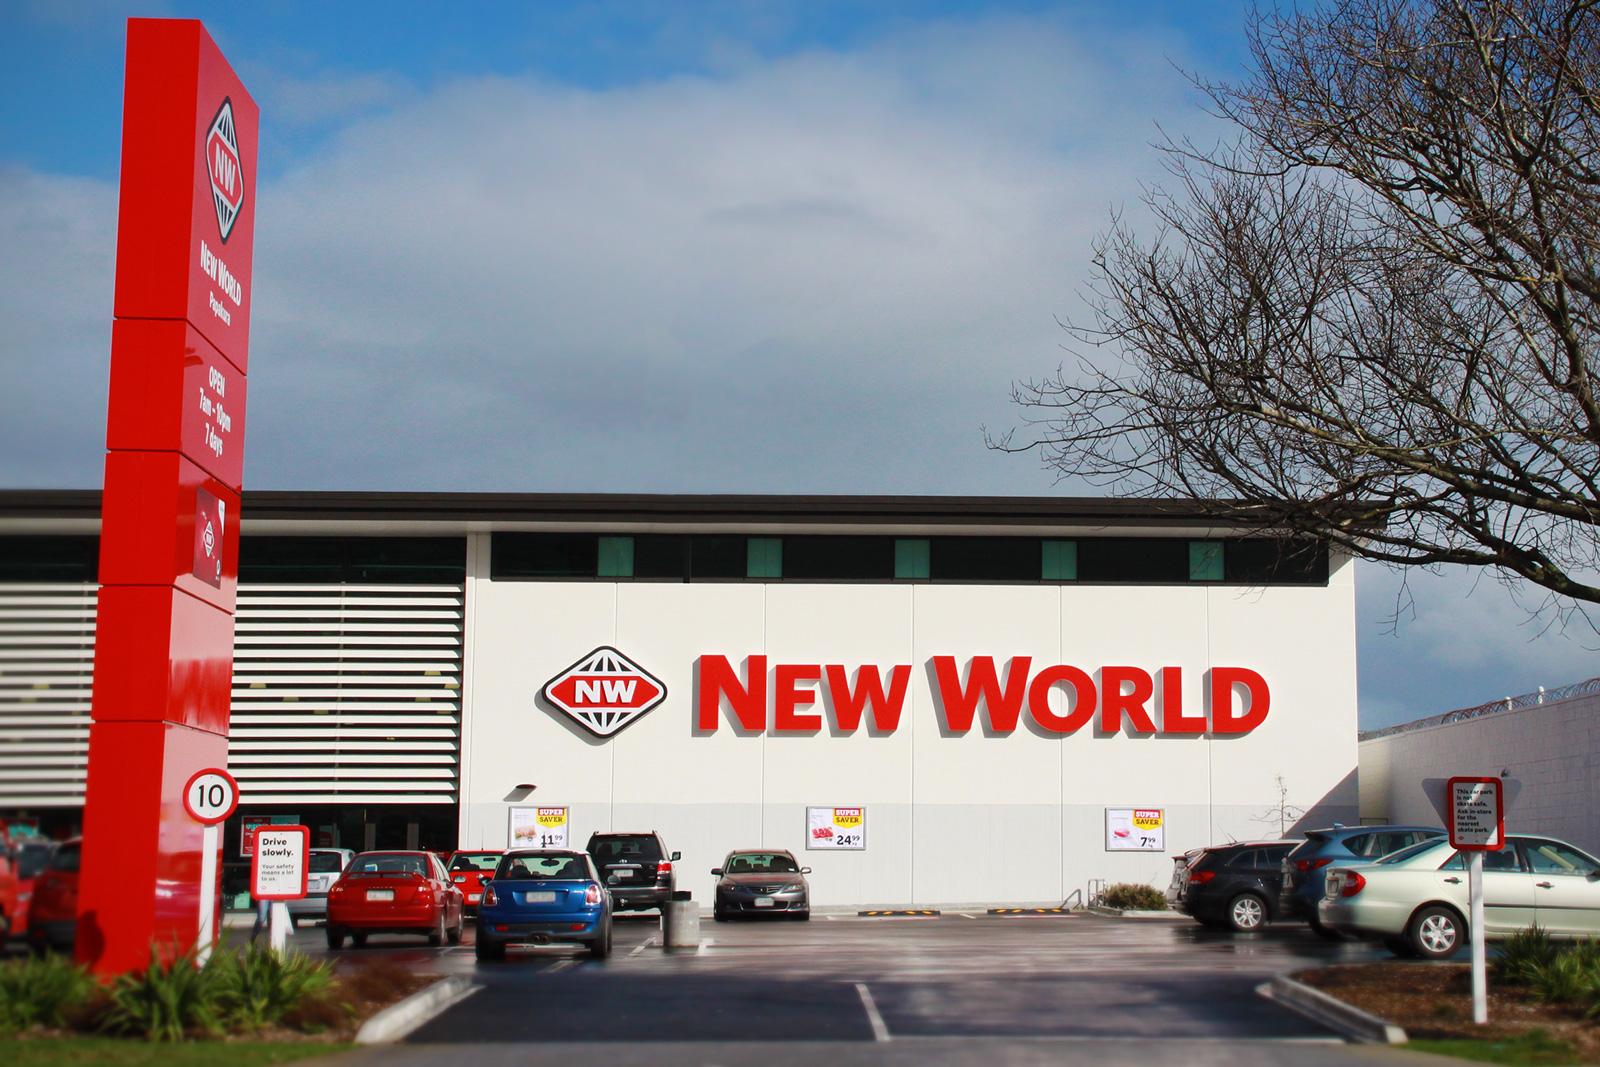 new world papakura 3d illuminated letters roadside pylon signage